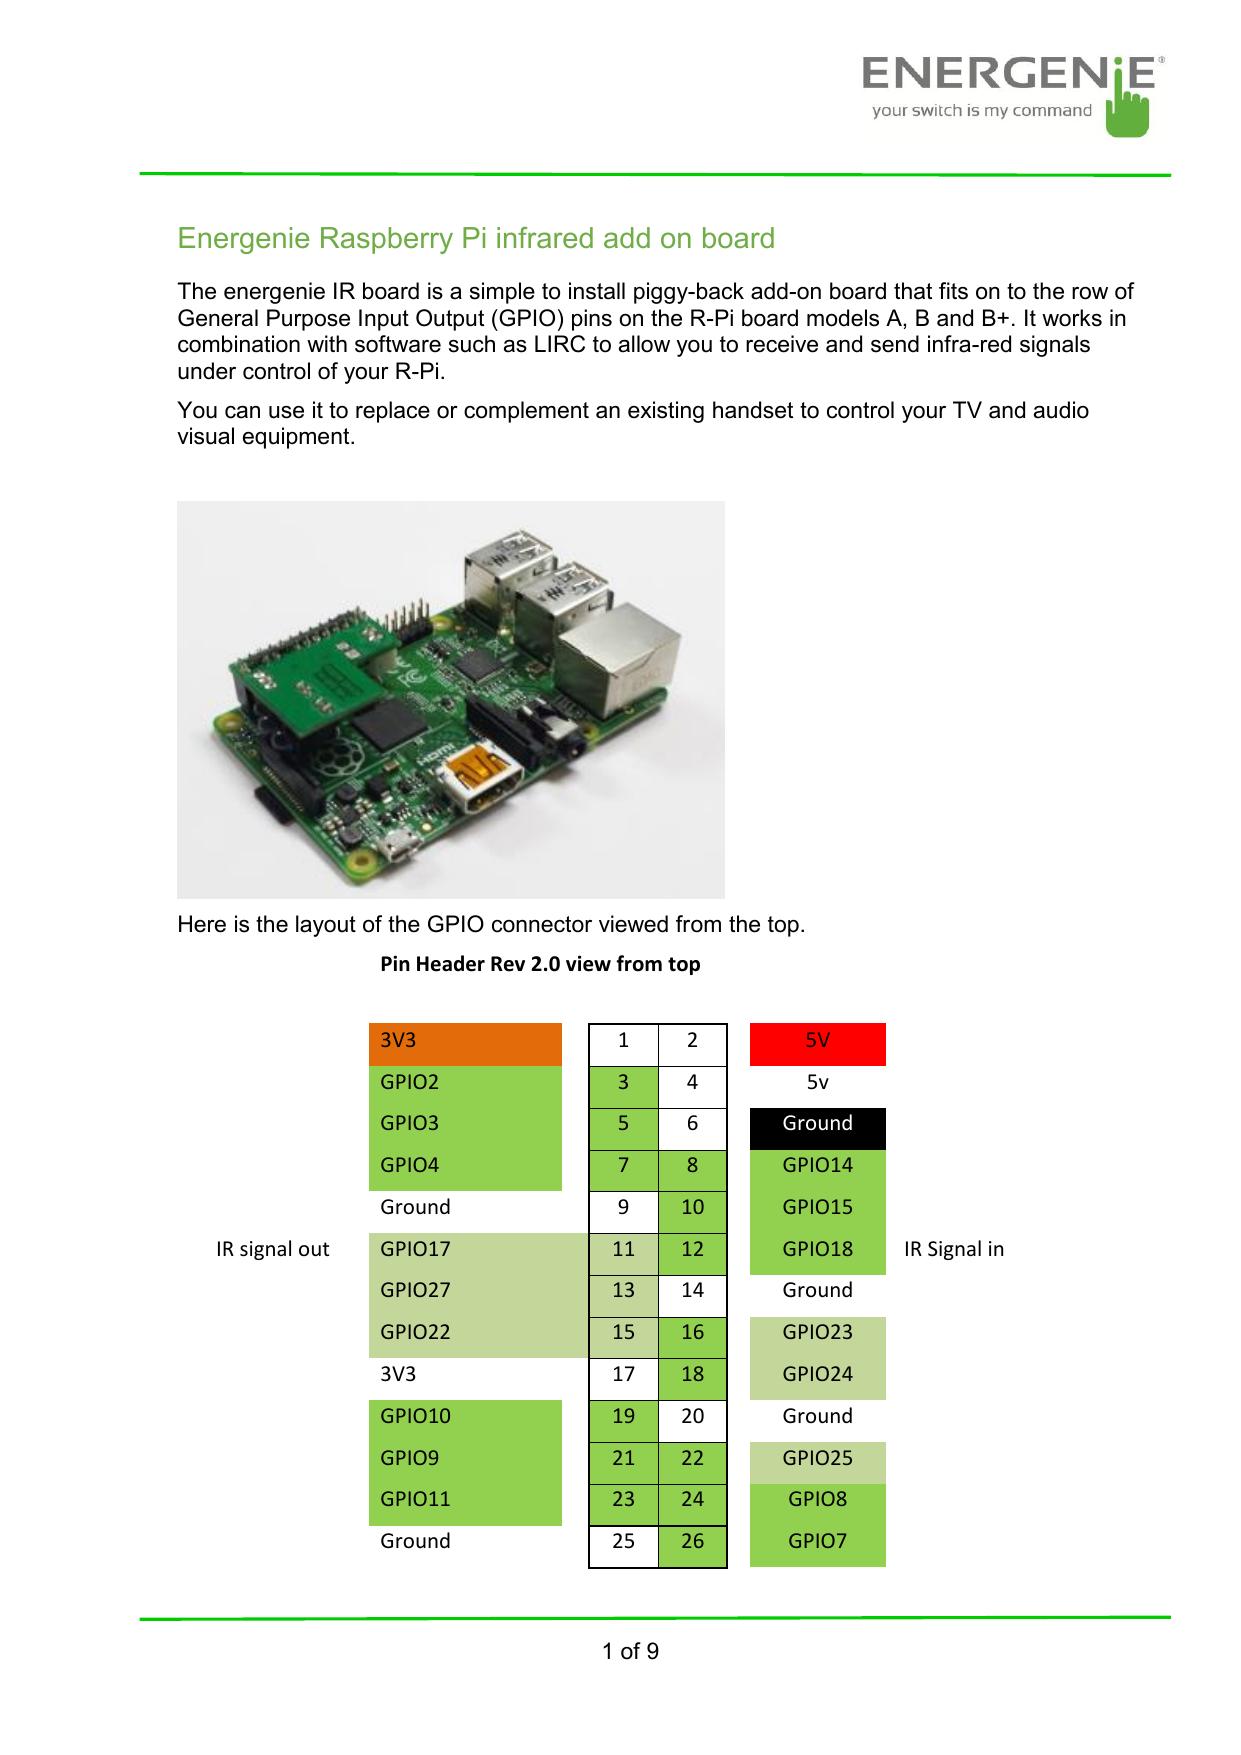 Energenie Raspberry Pi infrared add on board